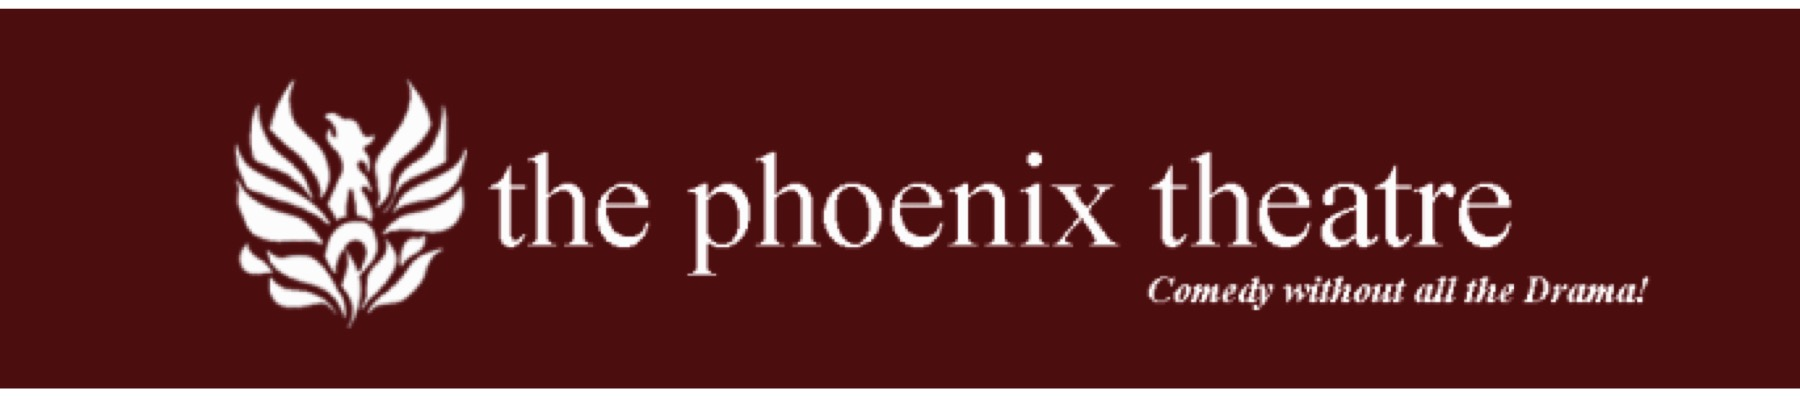 11. Phoenix Theatre 2015 jPeg